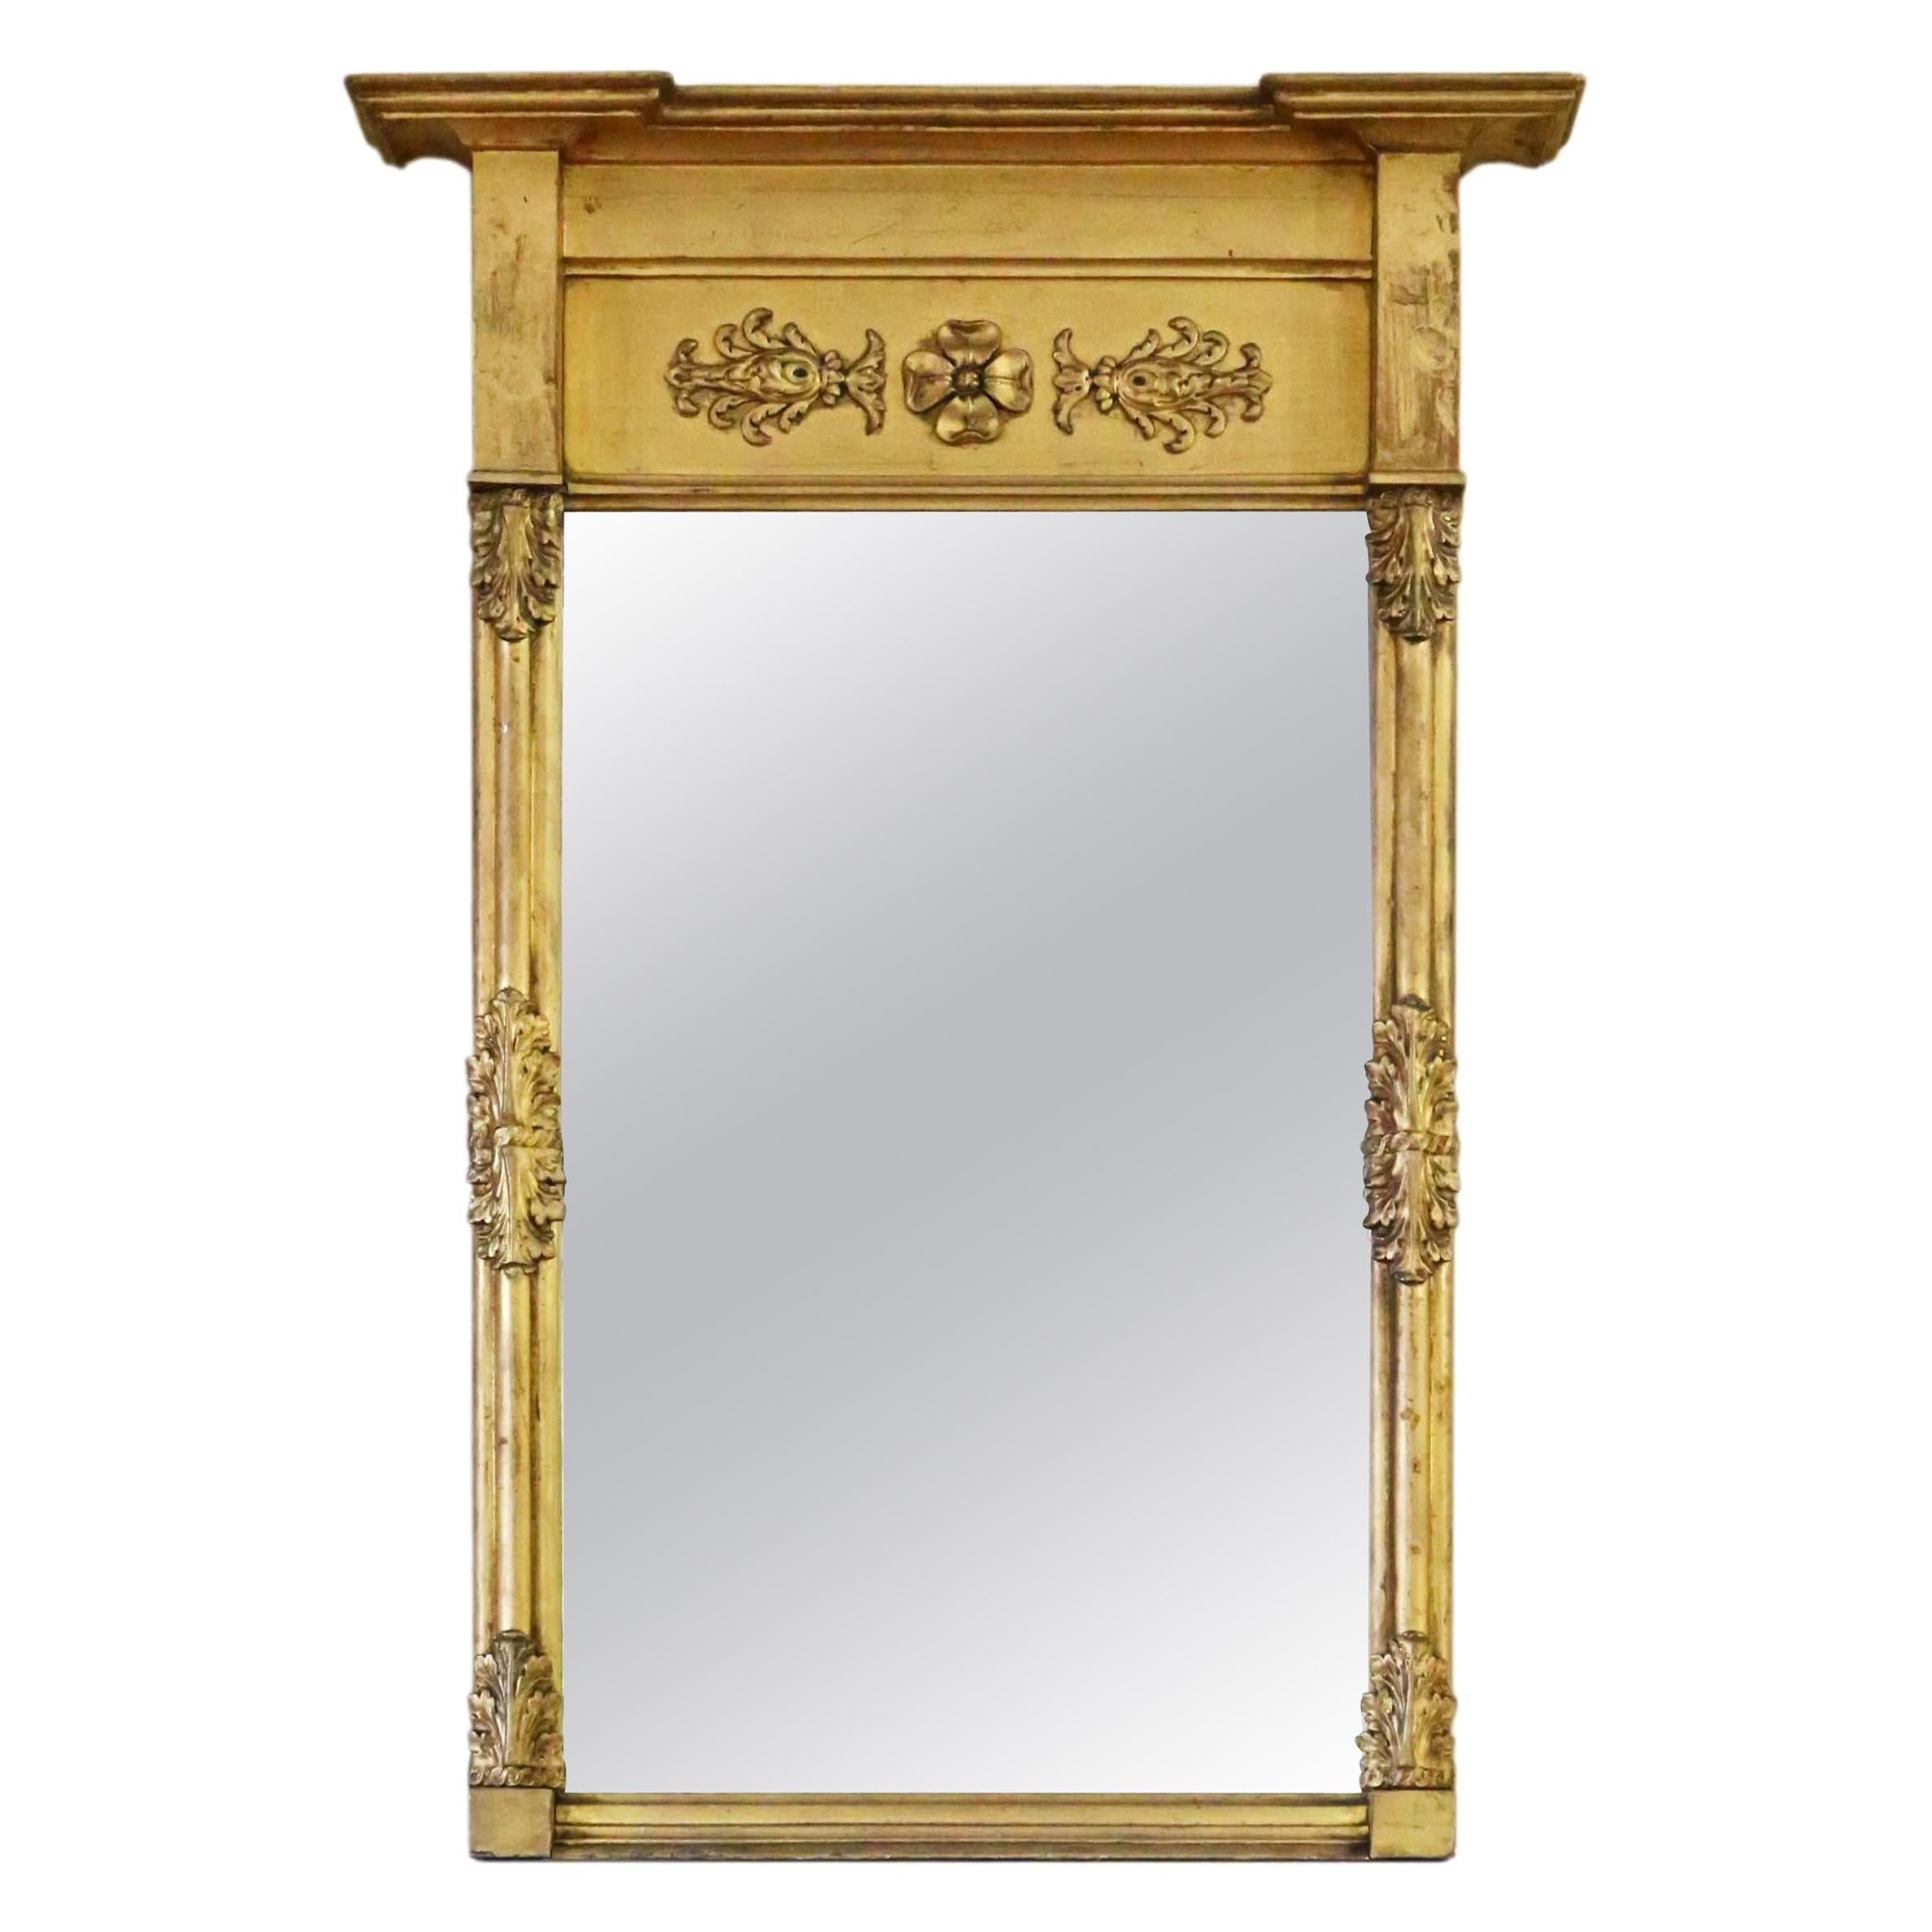 Antique Large Gilt 19th Century Pier Wall Mirror